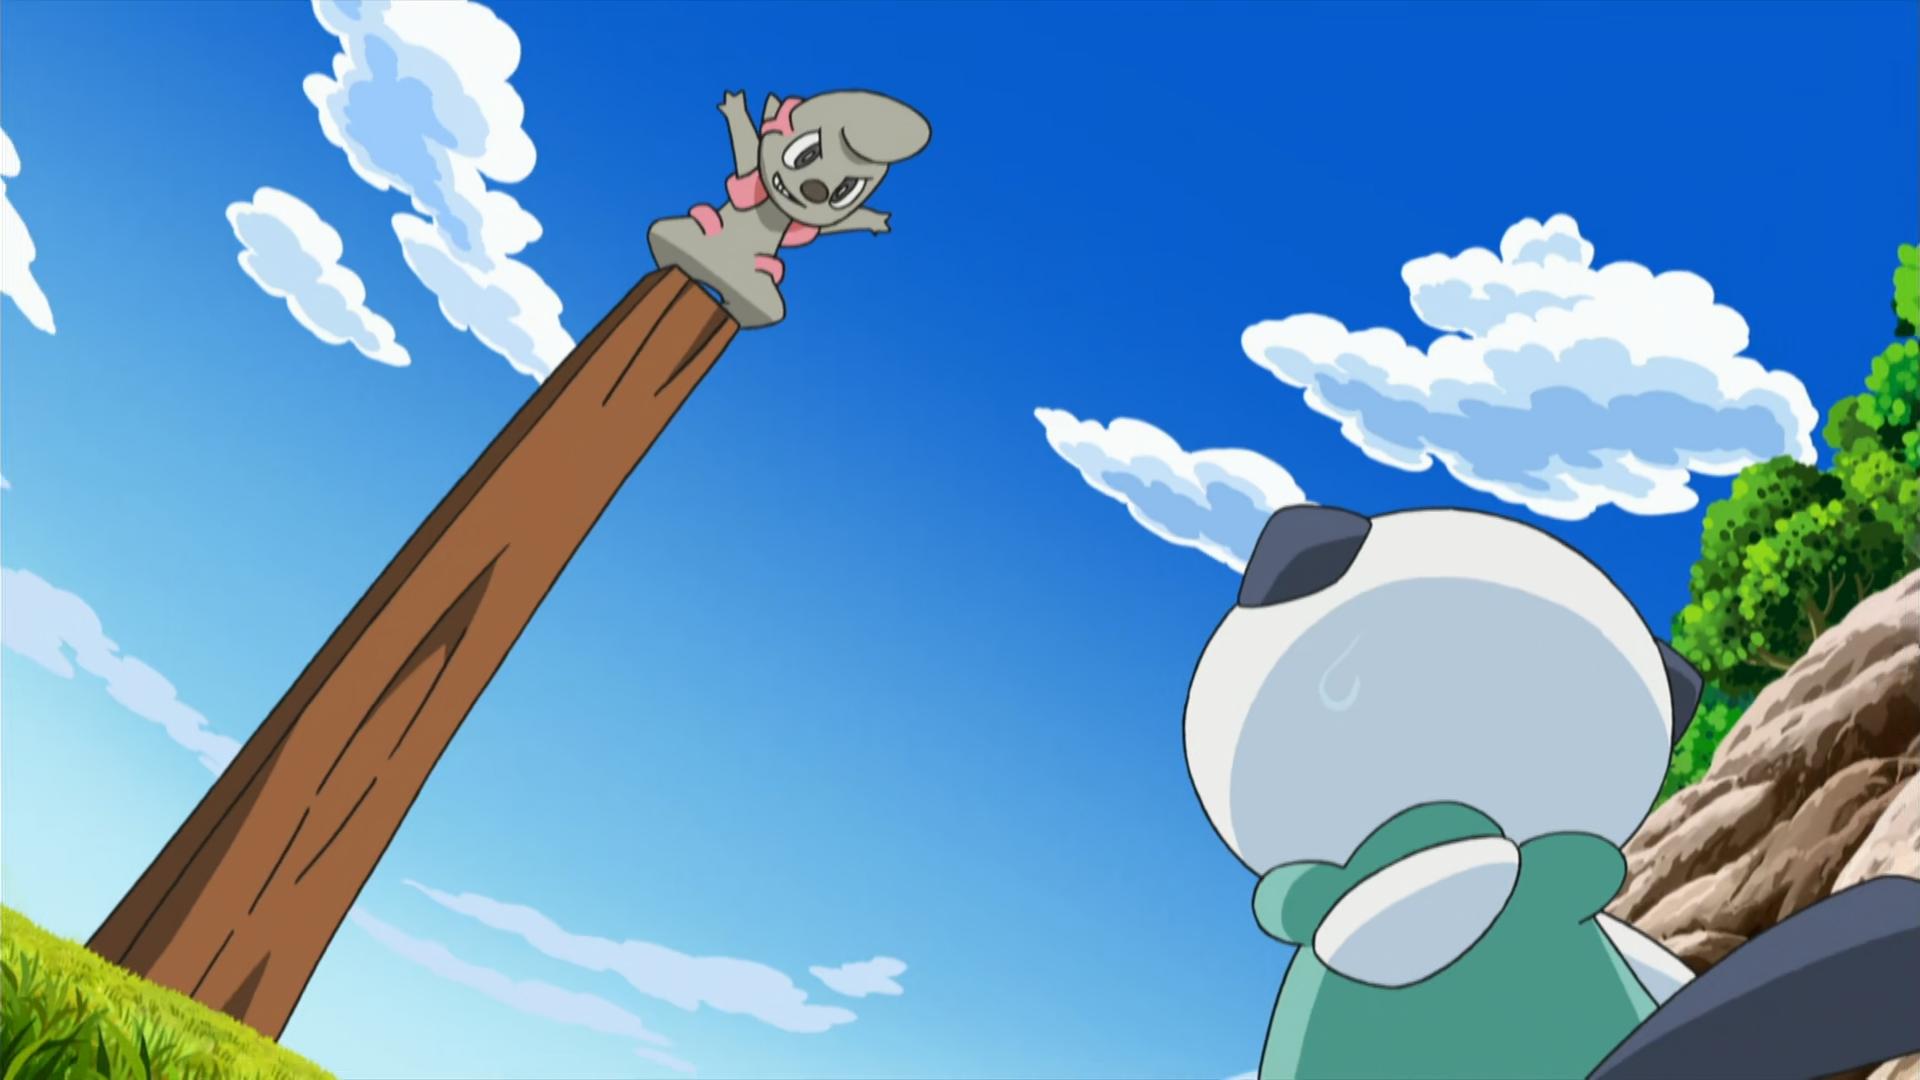 BW033: Ash and Trip's Third Battle!